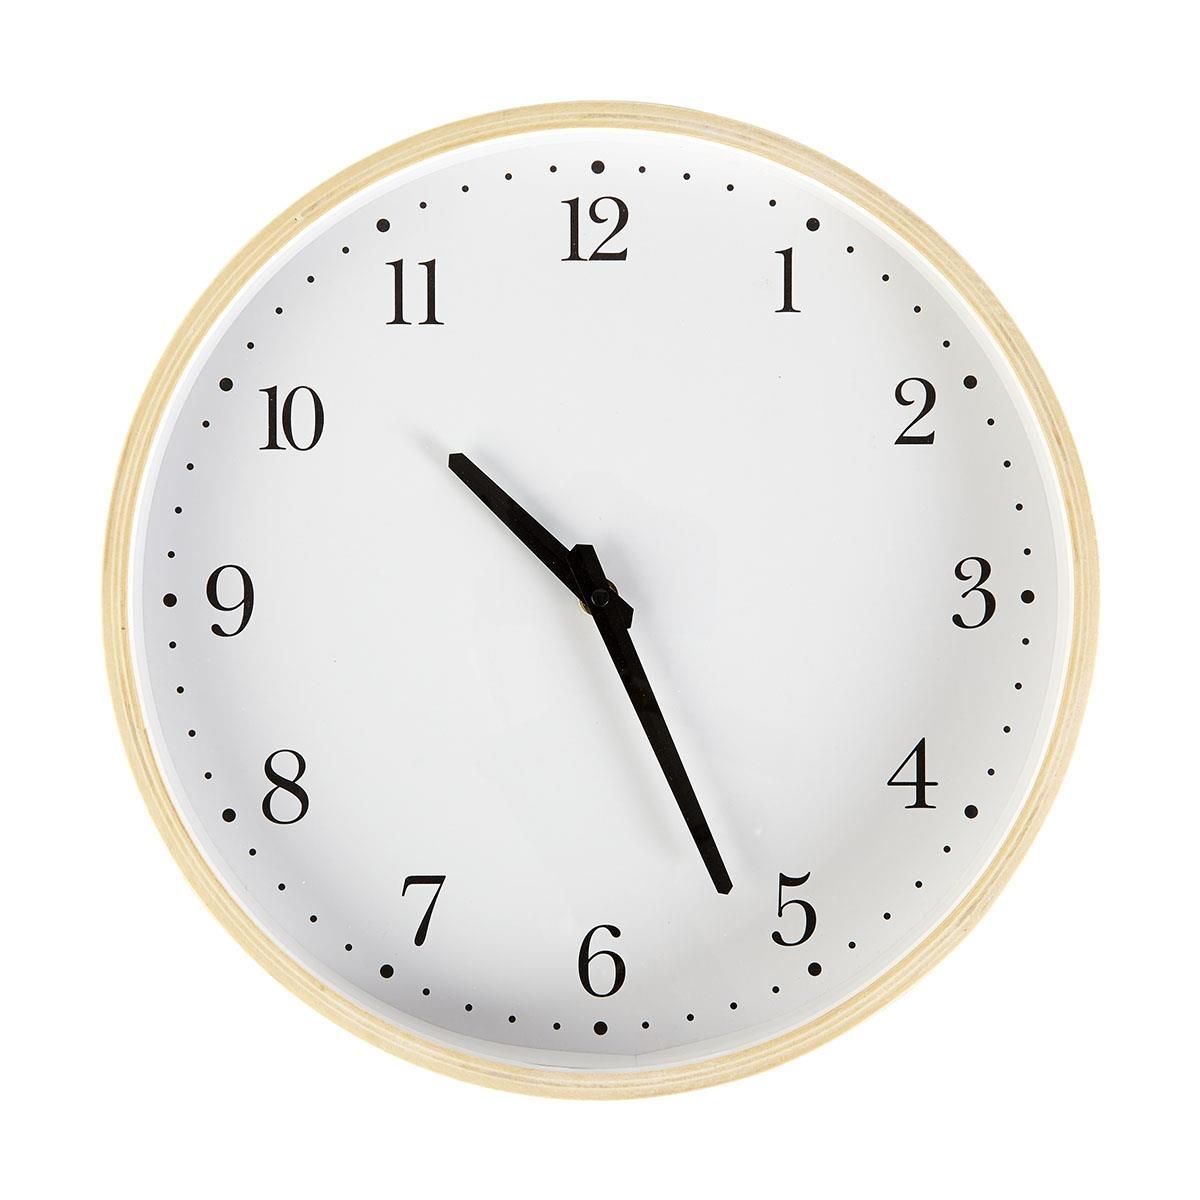 Digital Clocks Kmart Reversadermcream Com